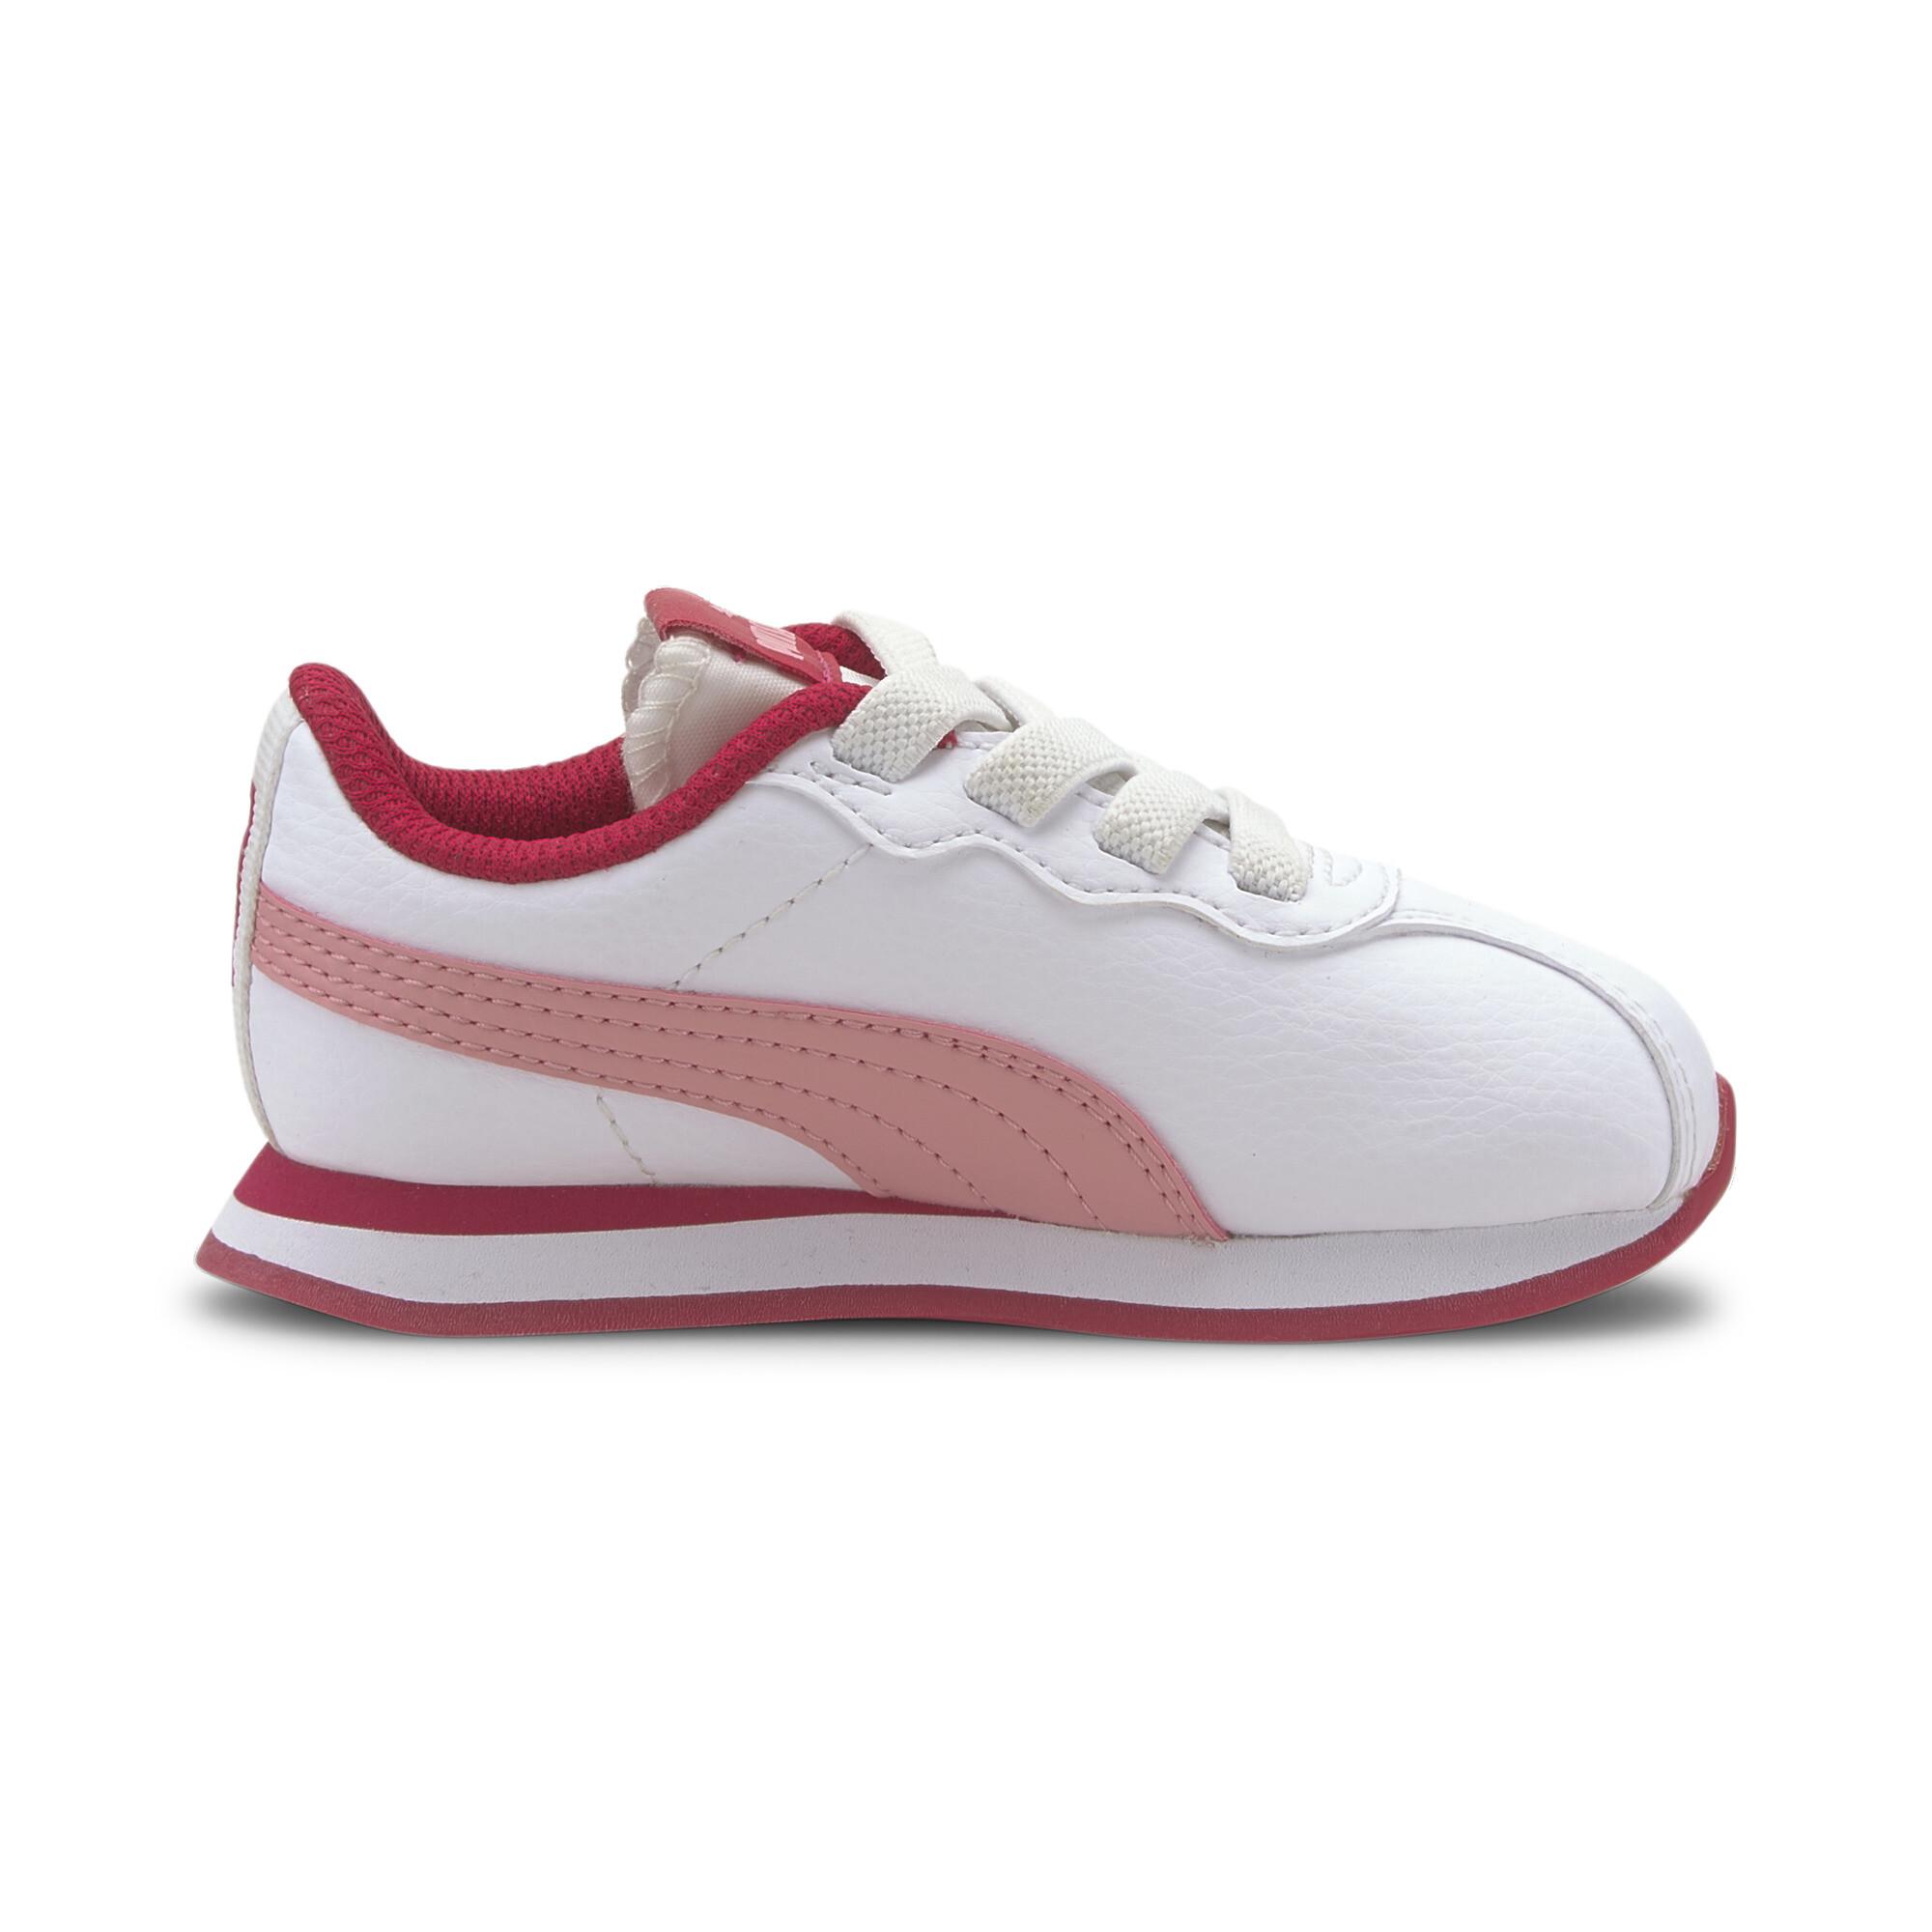 PUMA-Turin-II-AC-Toddler-Shoes-Unisex-Shoe-Kids thumbnail 21